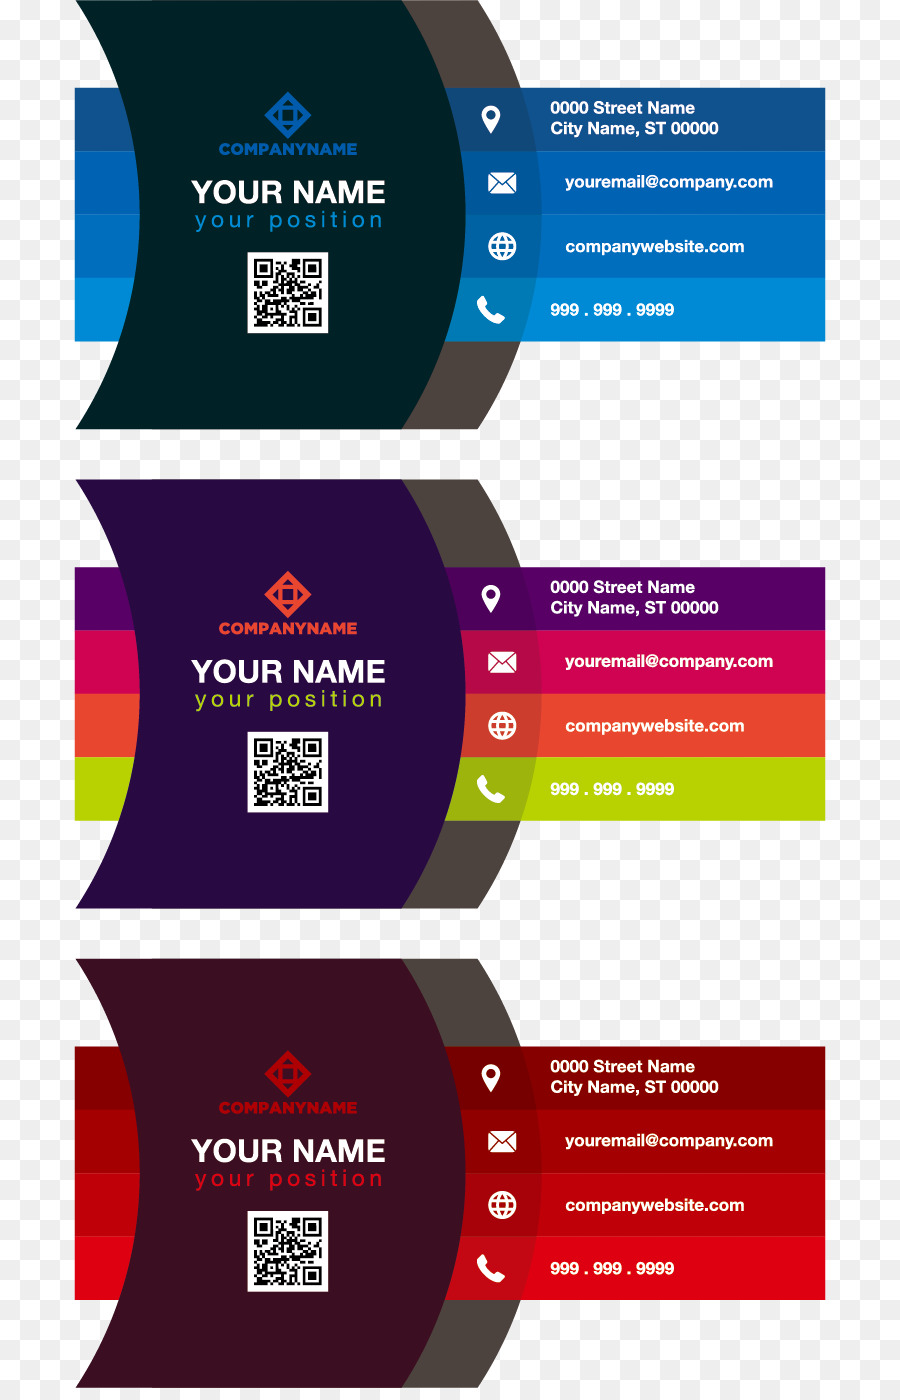 Business card Color Adobe Illustrator - Gradient color business card ...